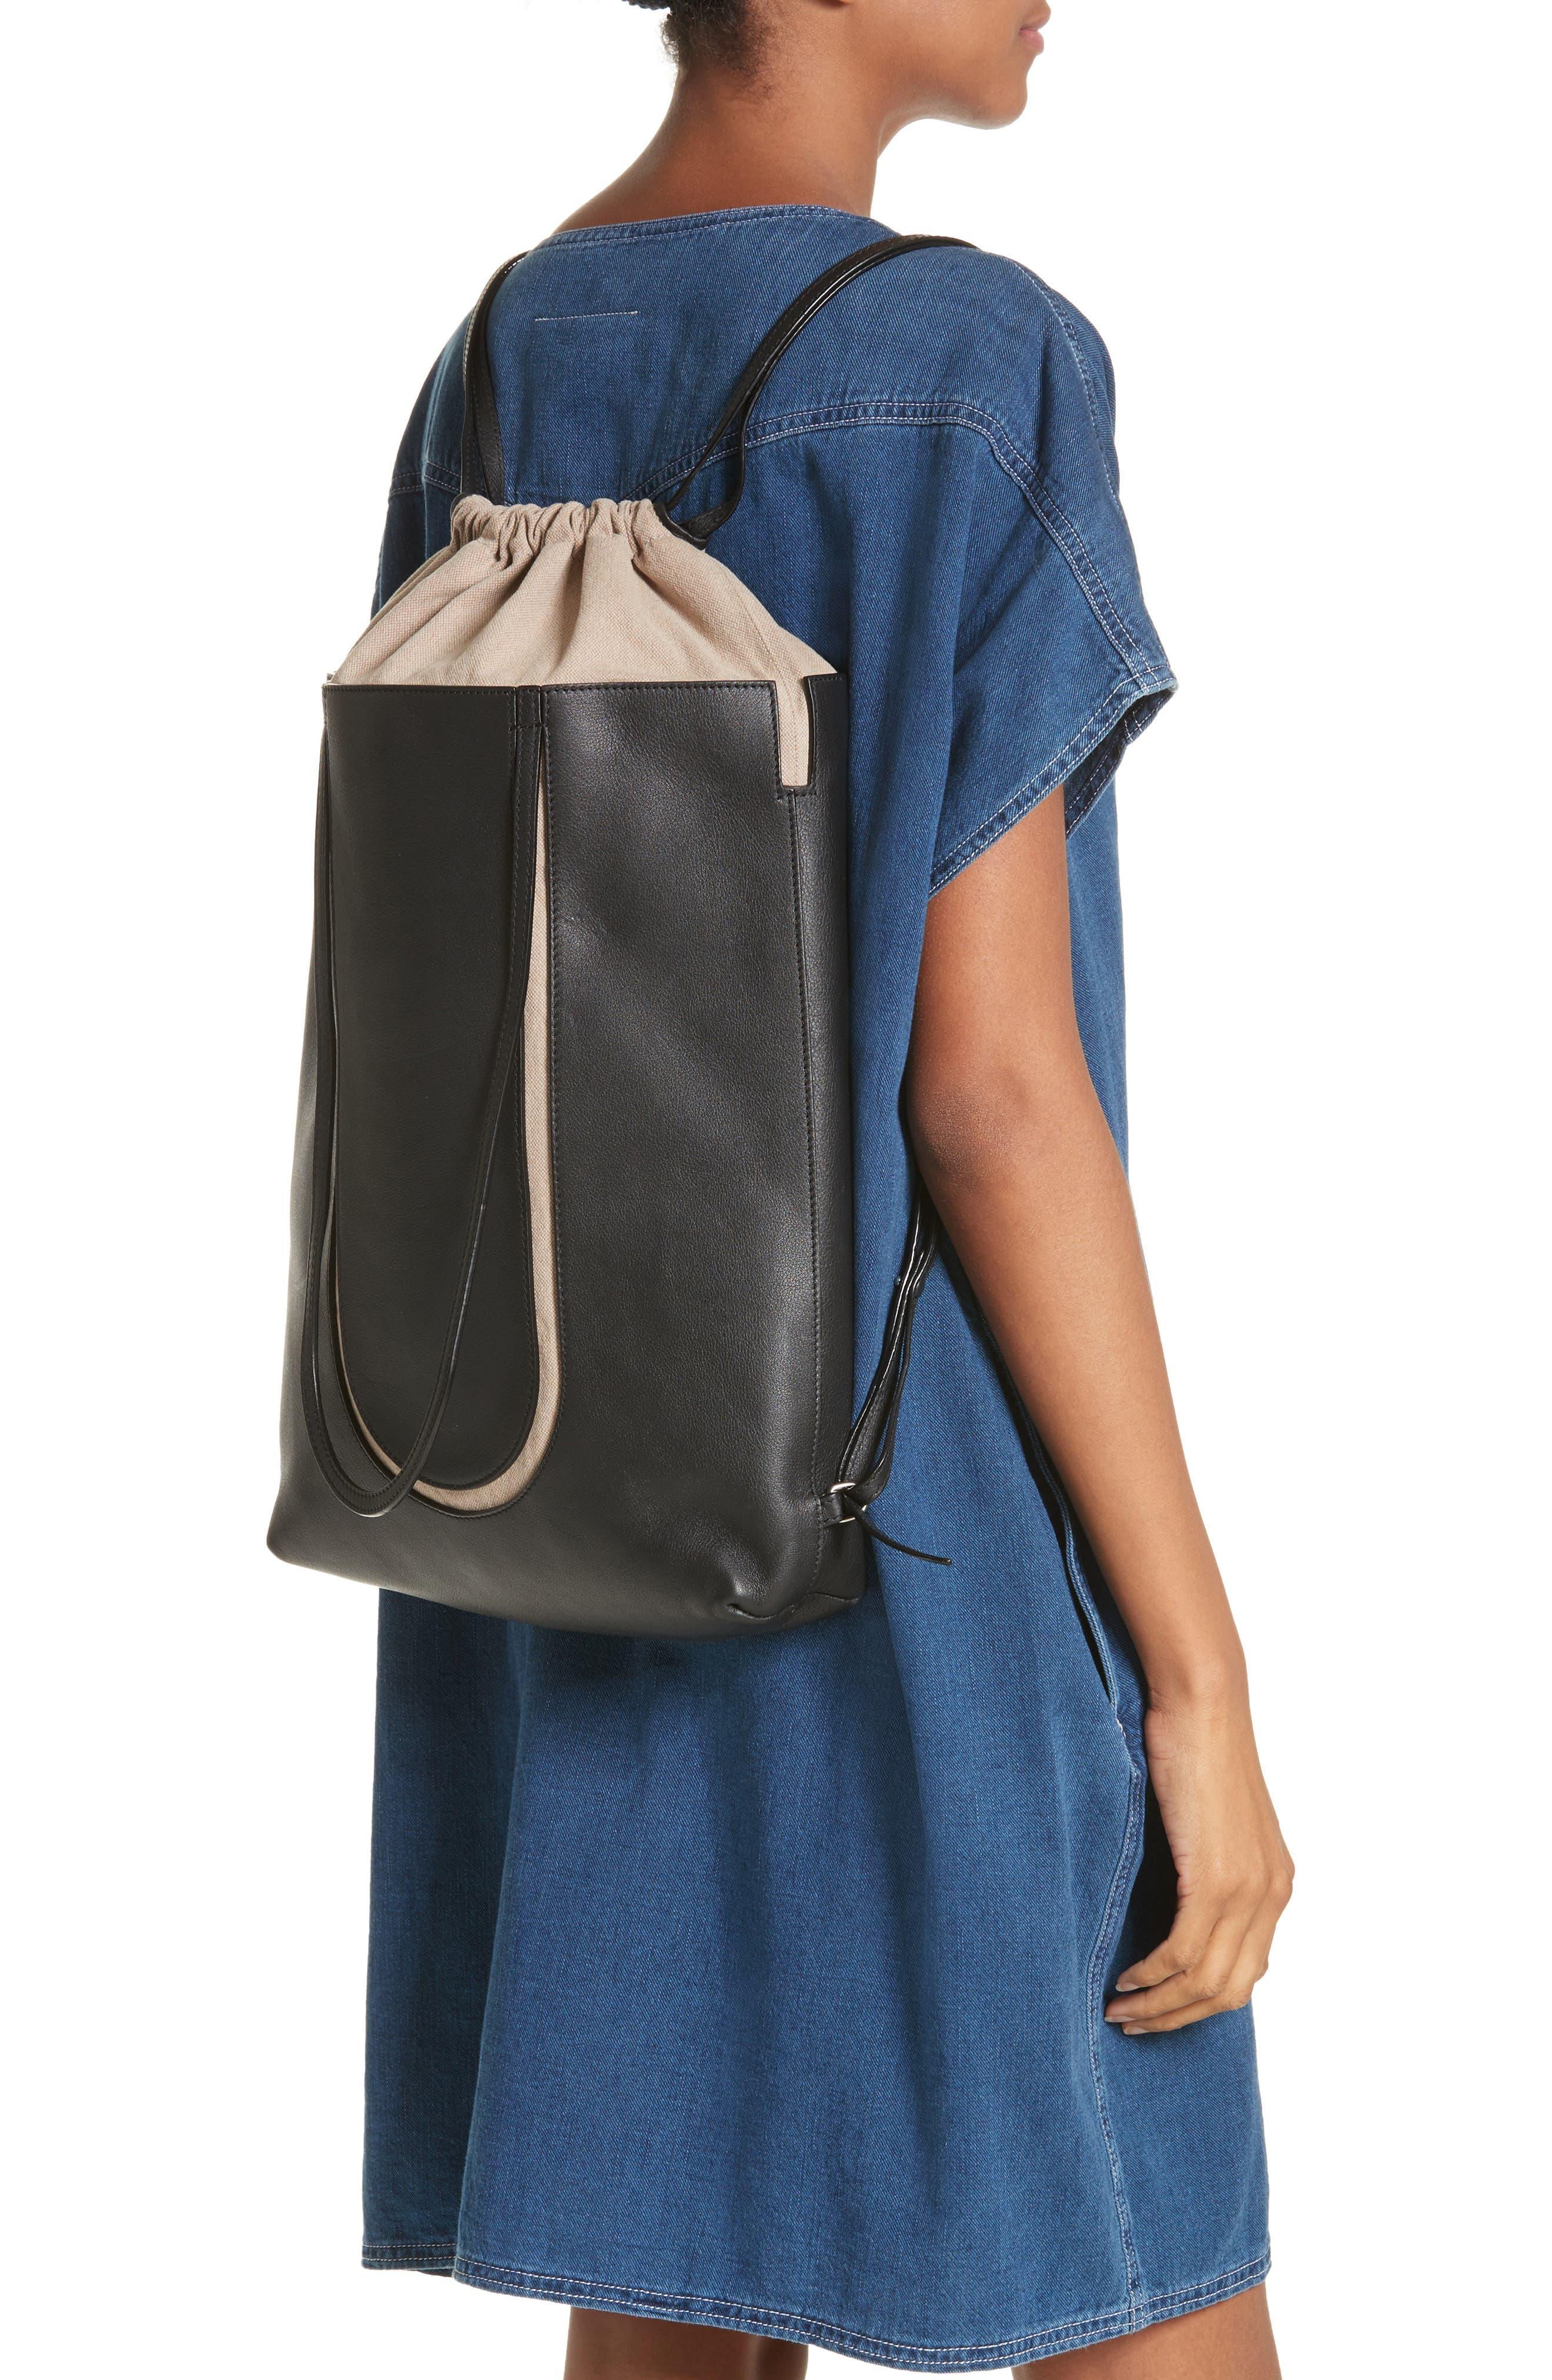 Calfskin Leather Backpack,                             Alternate thumbnail 2, color,                             Black